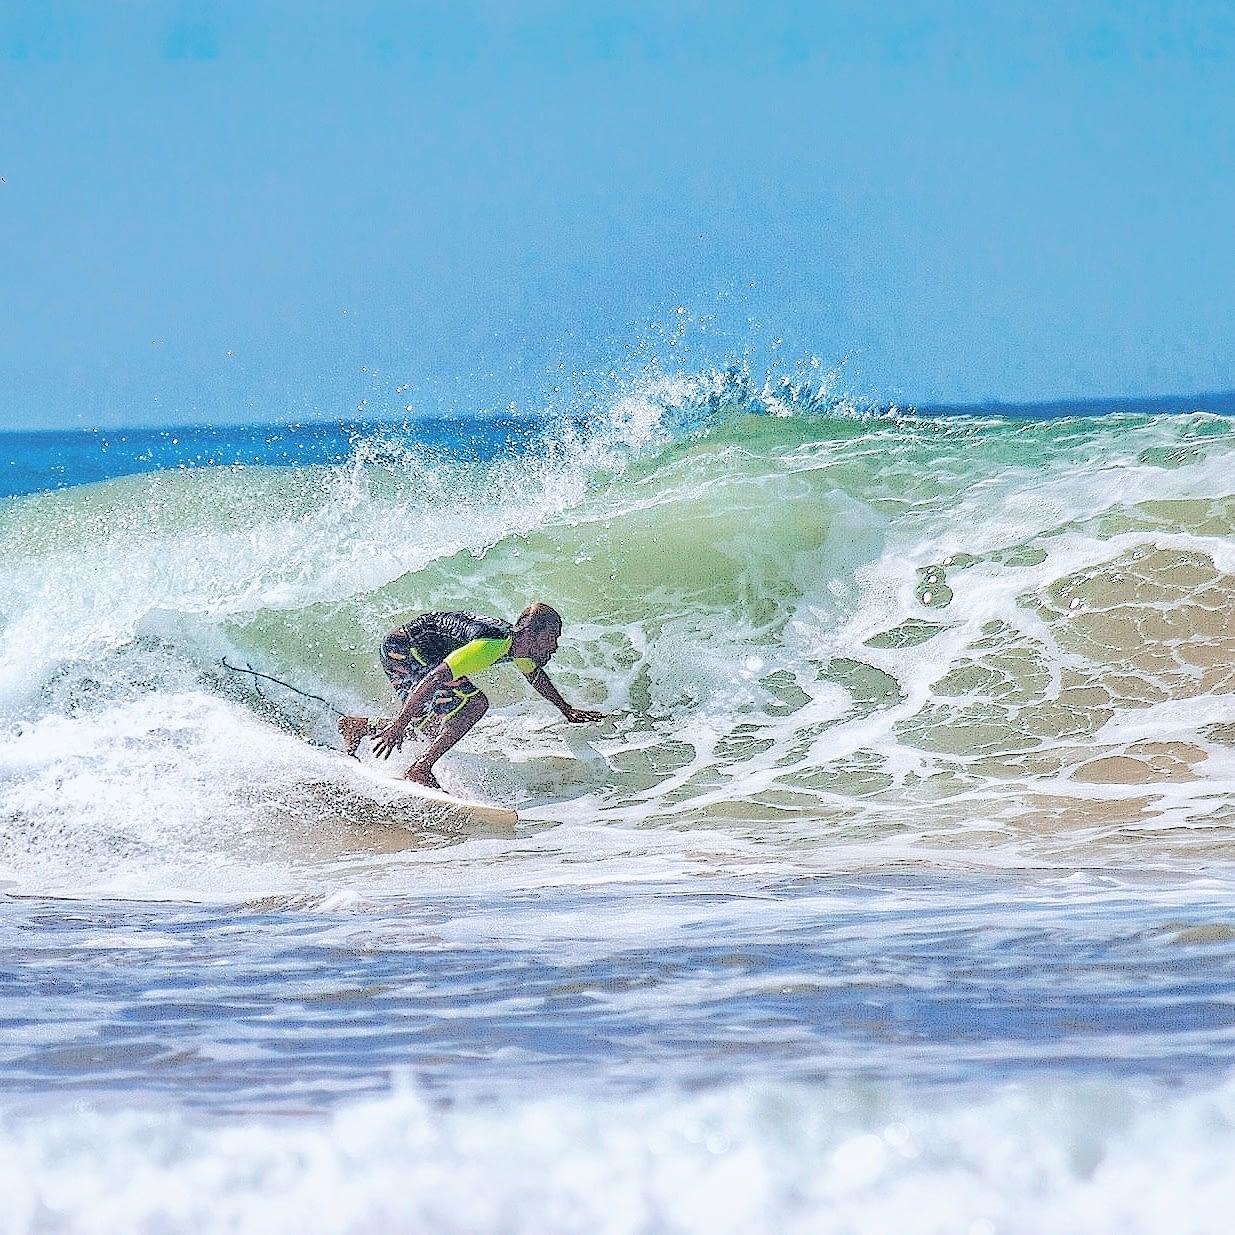 Surfing Weligamasurf surf